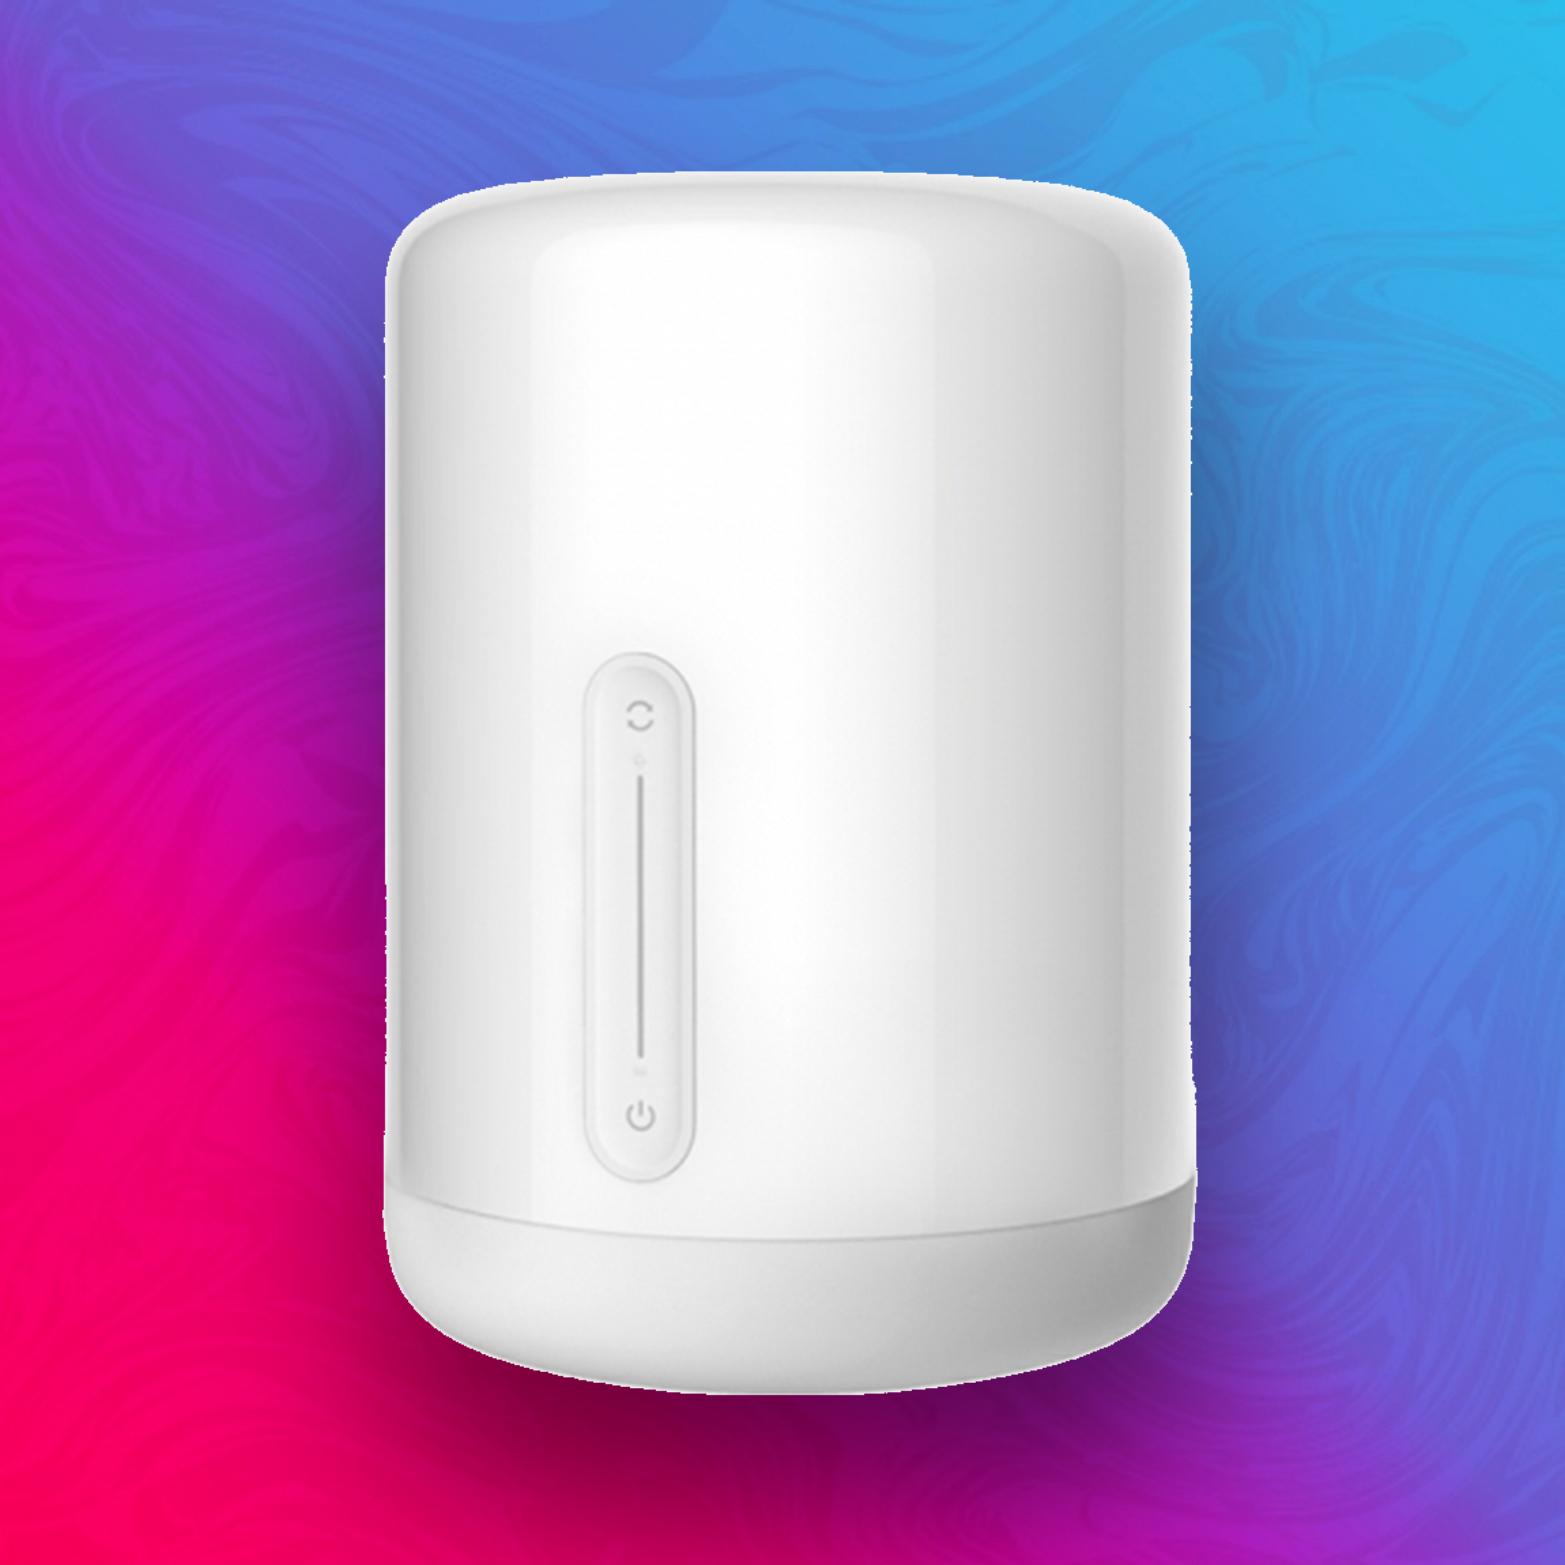 Xiaomi Mijia Nachttischlampe V2   RGB/Weiß - WLAN - HomeKit (Bedside Lamp   MJCTD02YL)